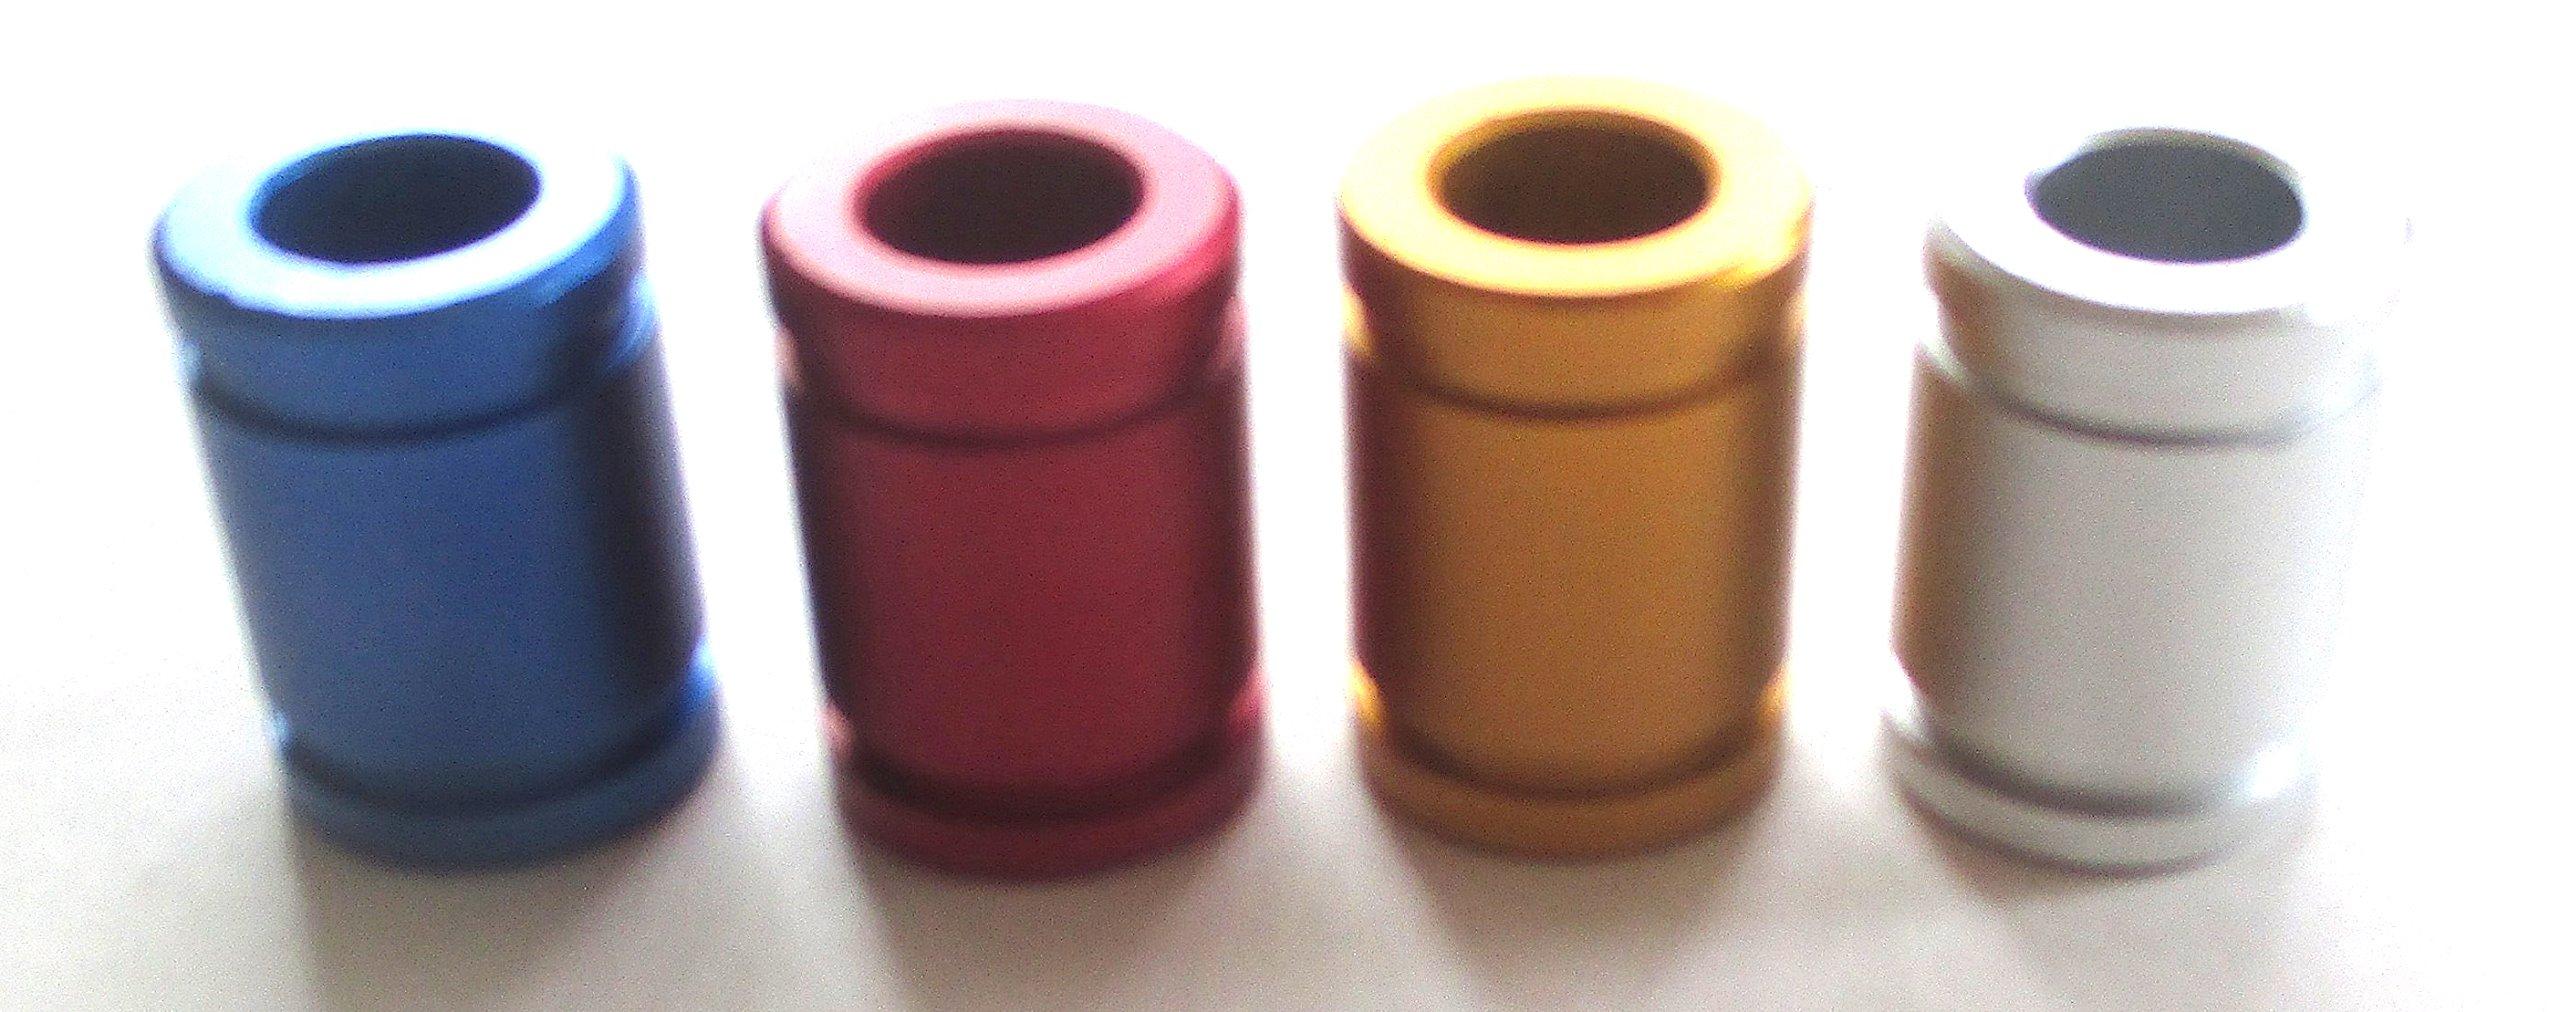 Lot of 4 Aluminum Series Cigarette Snuffers Instant Cigarette Extinguisher